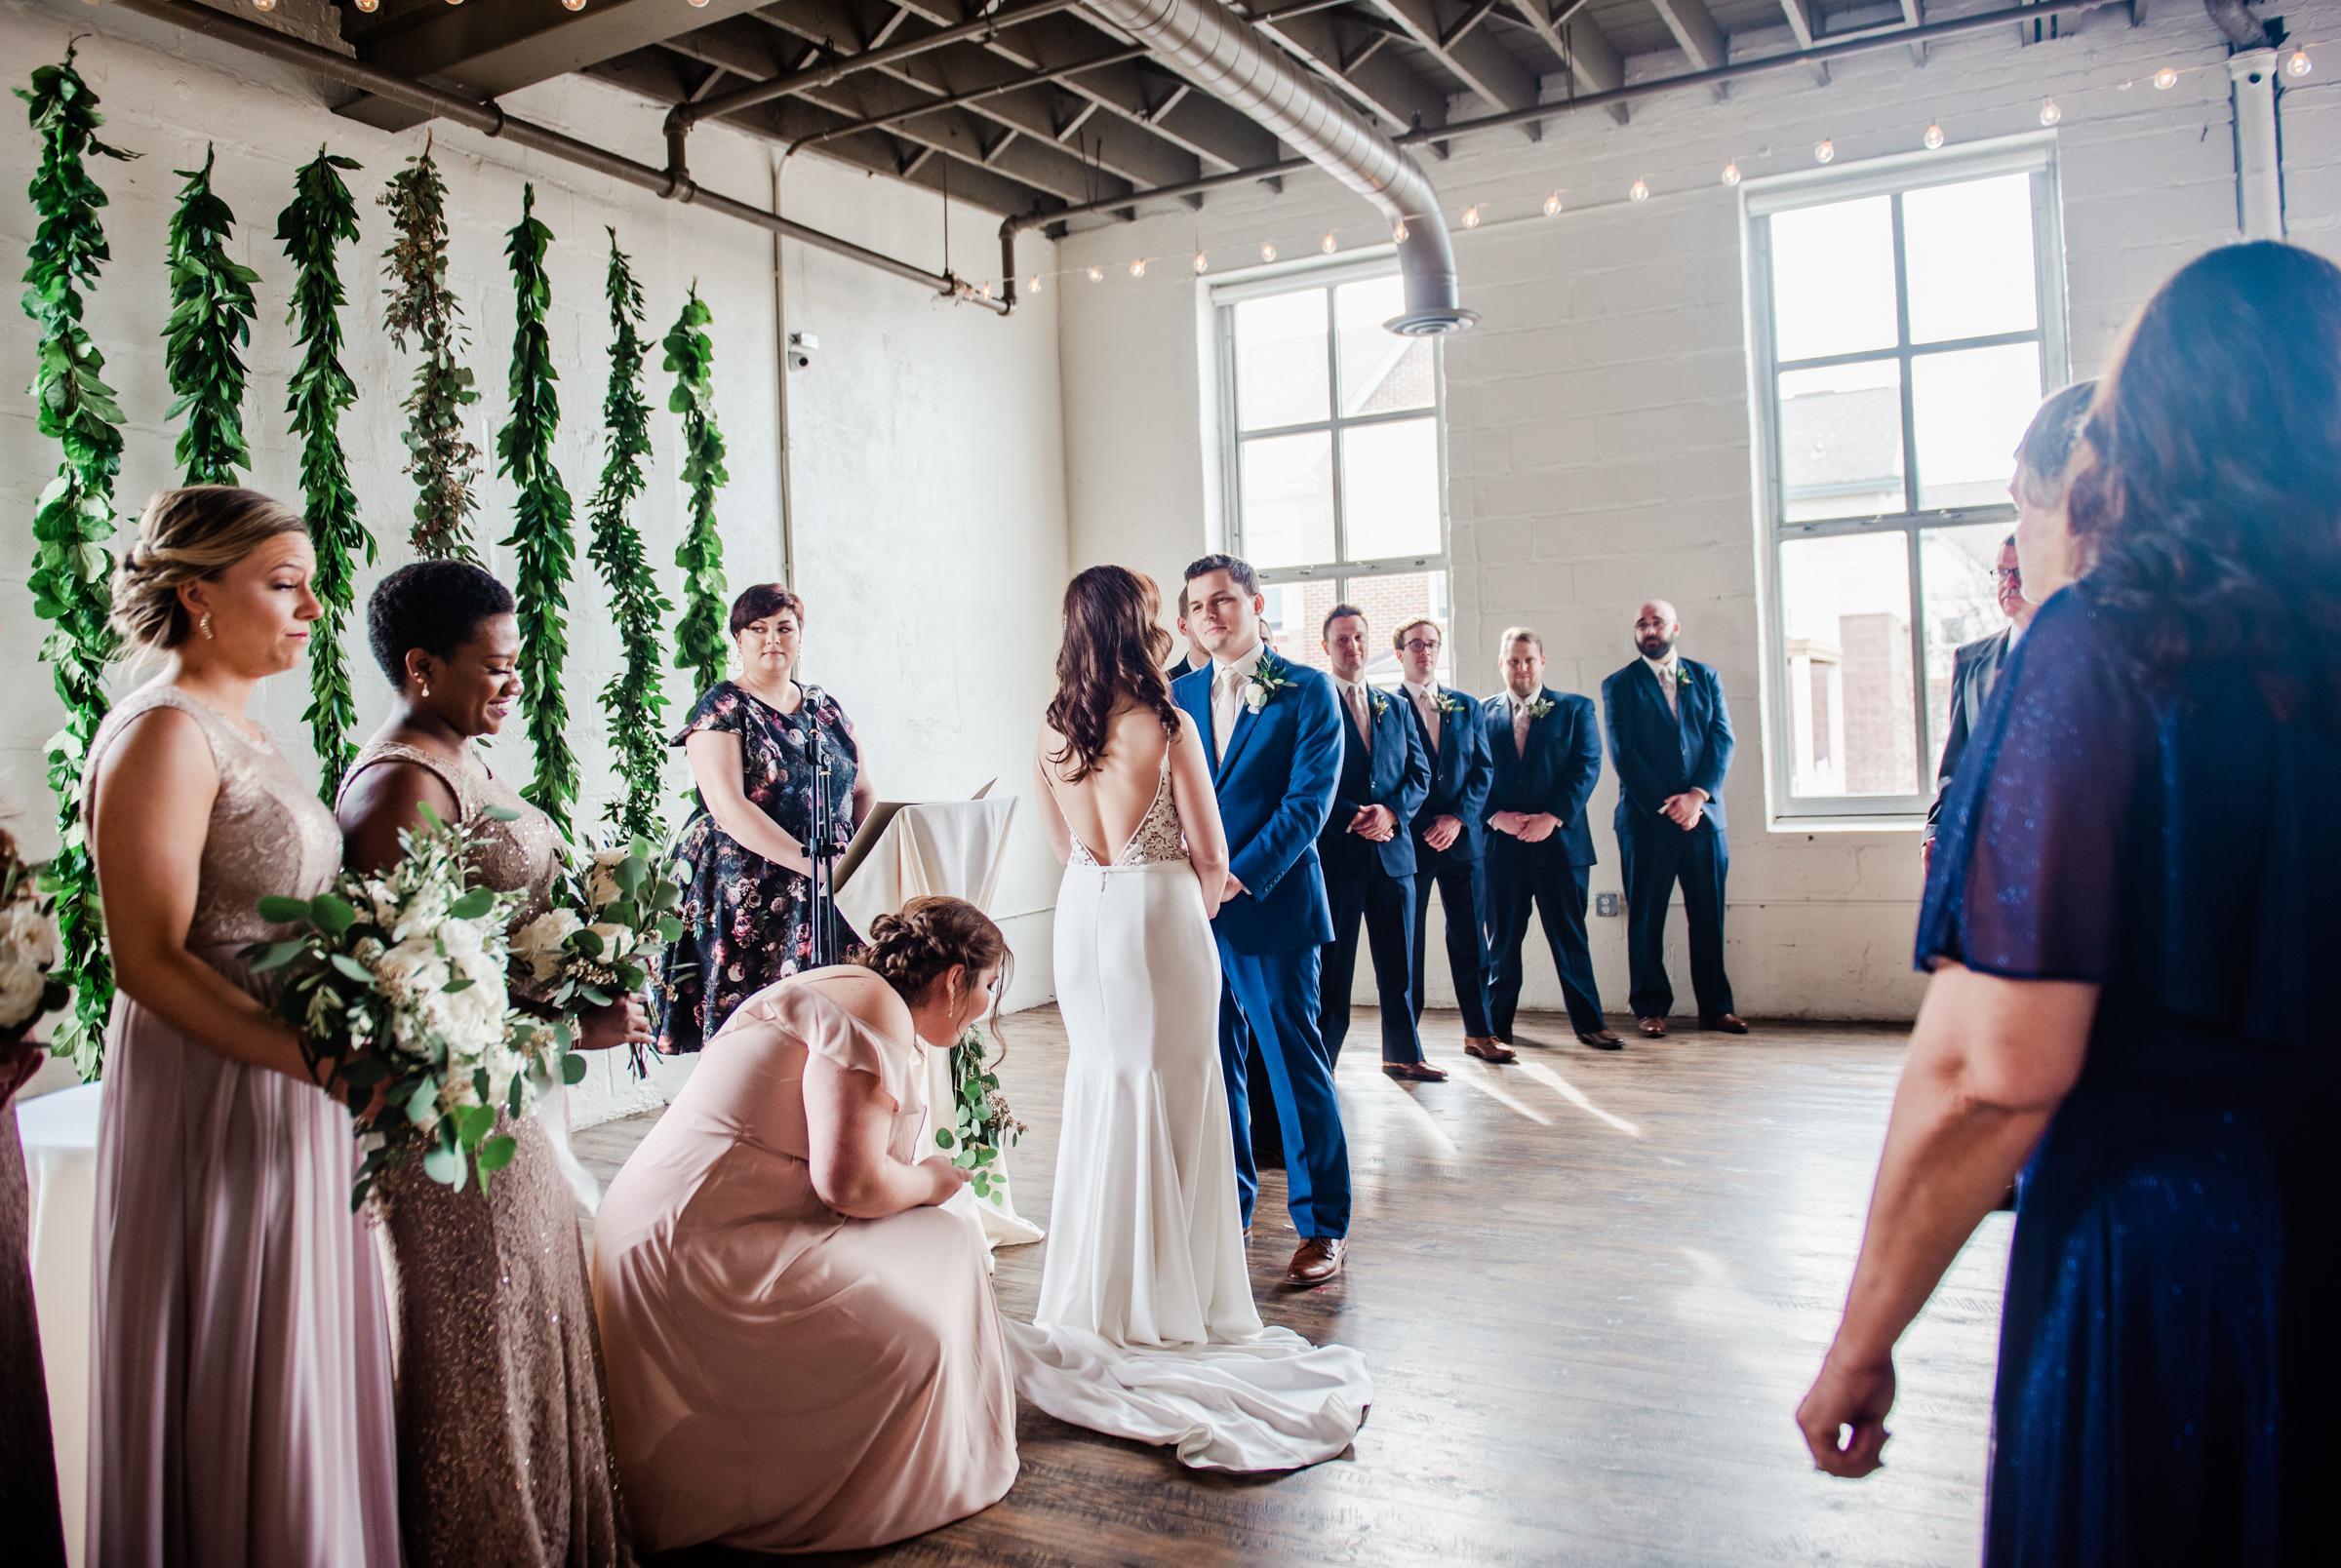 The_Arbor_LoftRochester_Wedding_JILL_STUDIO_Rochester_NY_Photographer_170506.jpg